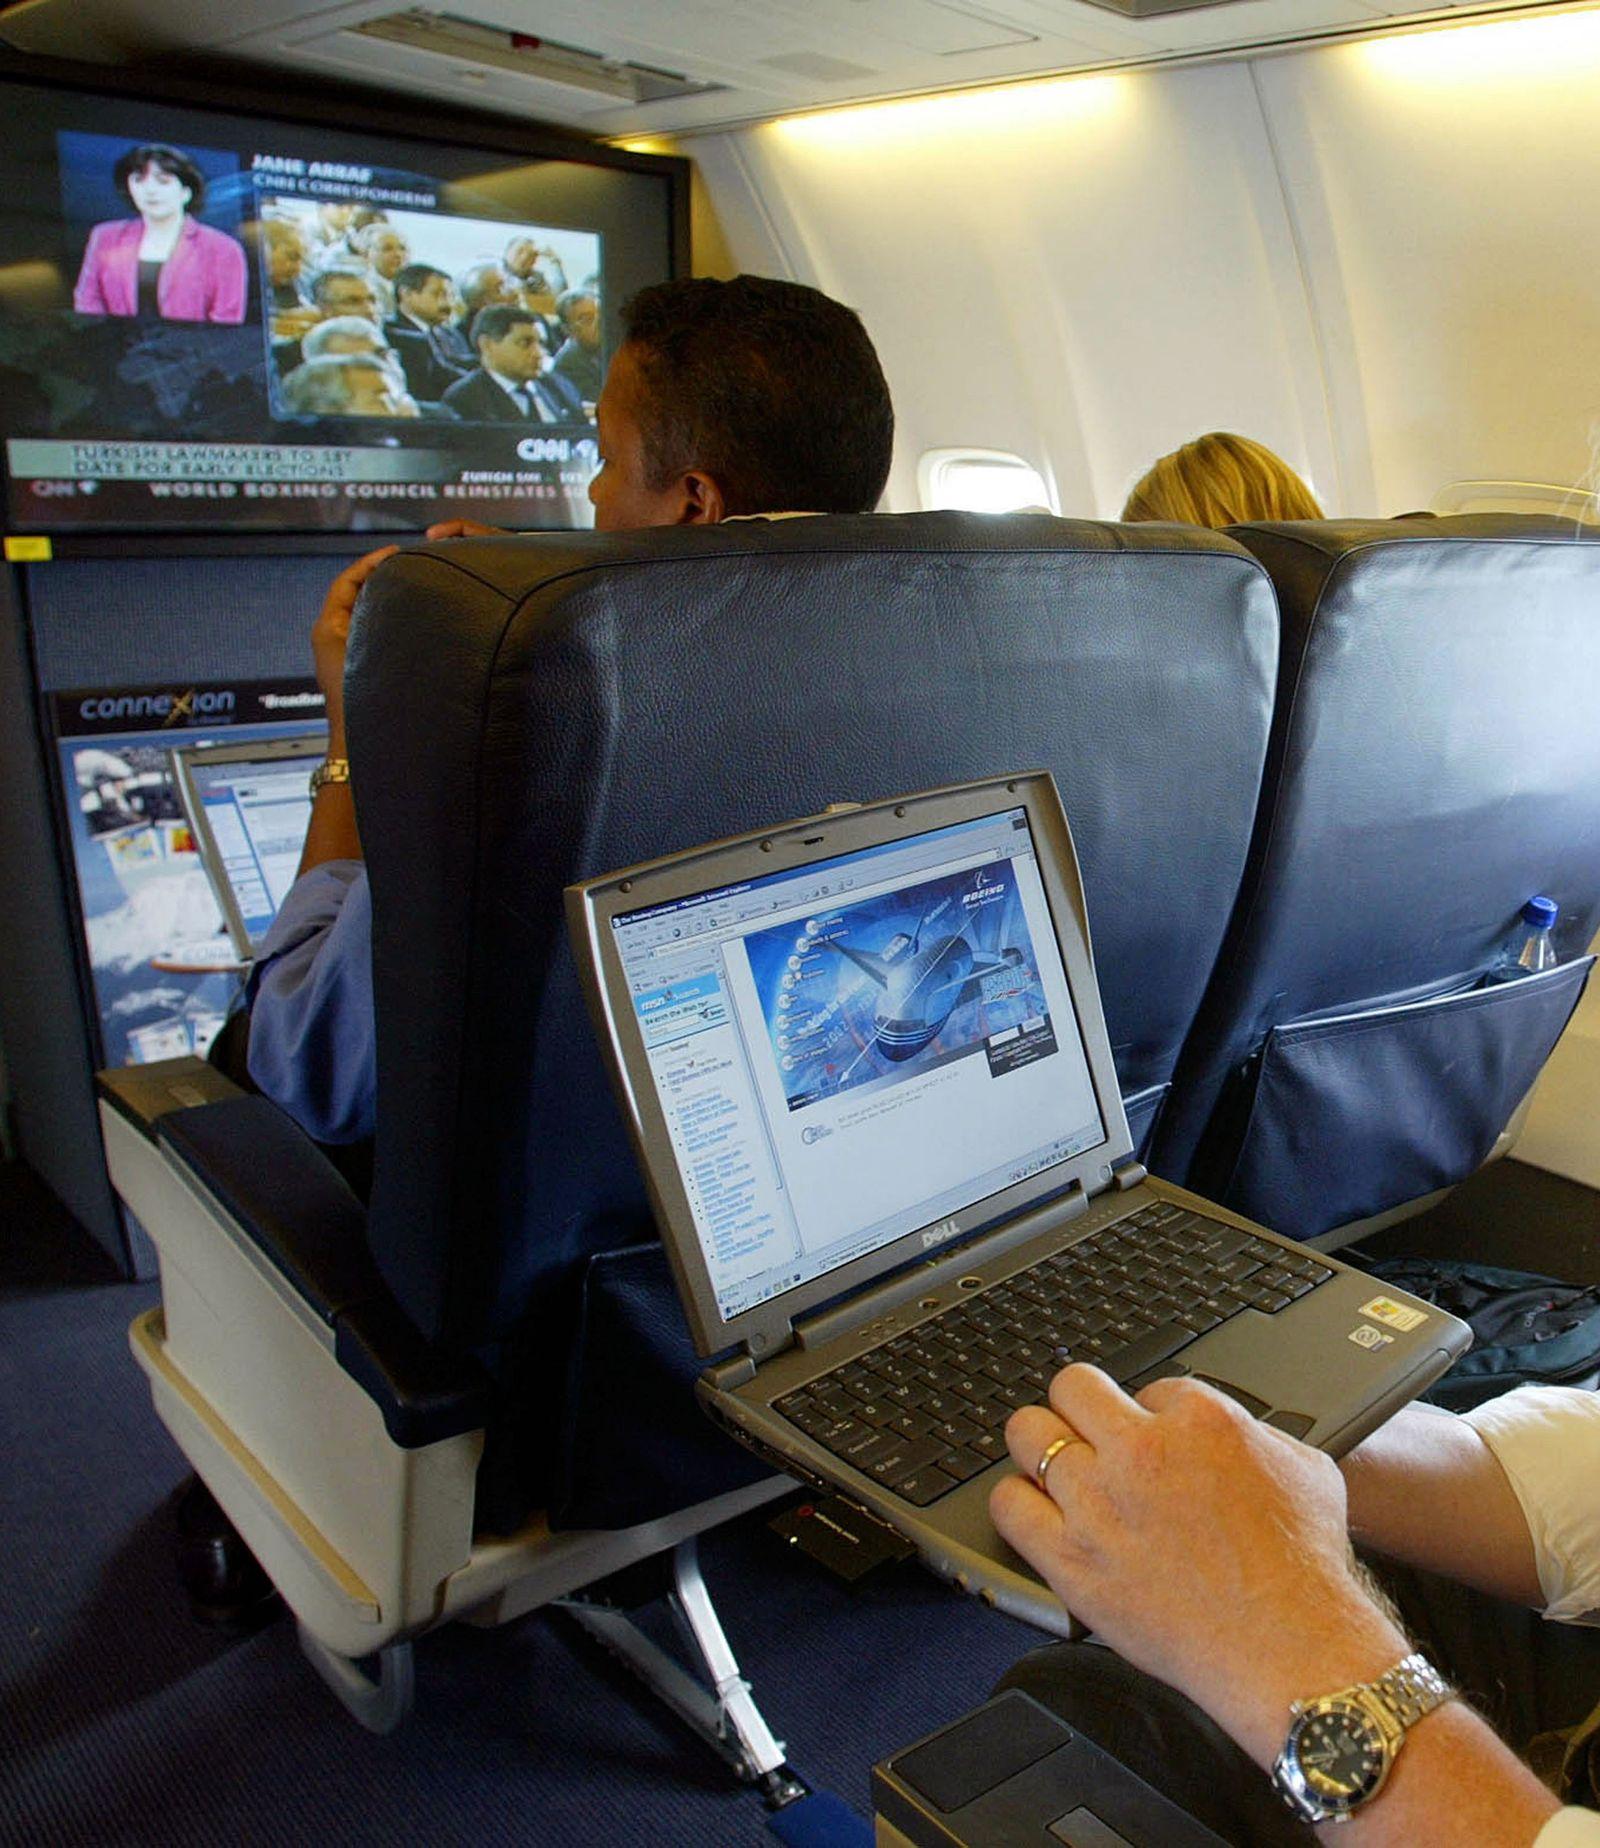 Laptop / Flugzeug / Notebook